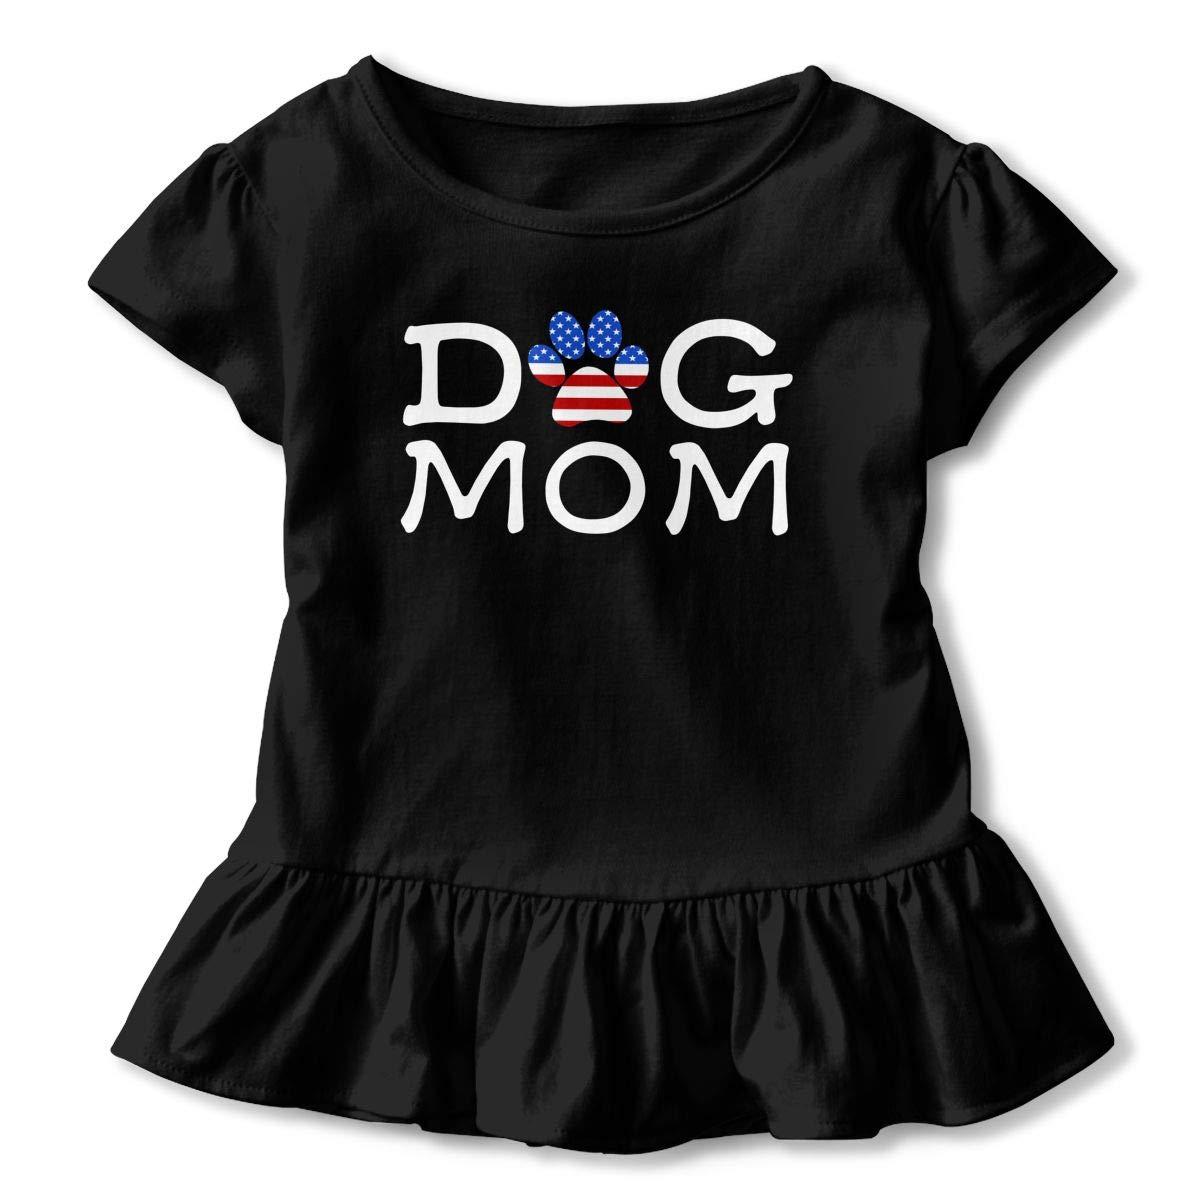 Dog Mom USA Flag Toddler Baby Girls Cotton Ruffle Short Sleeve Top Comfortable T-Shirt 2-6T